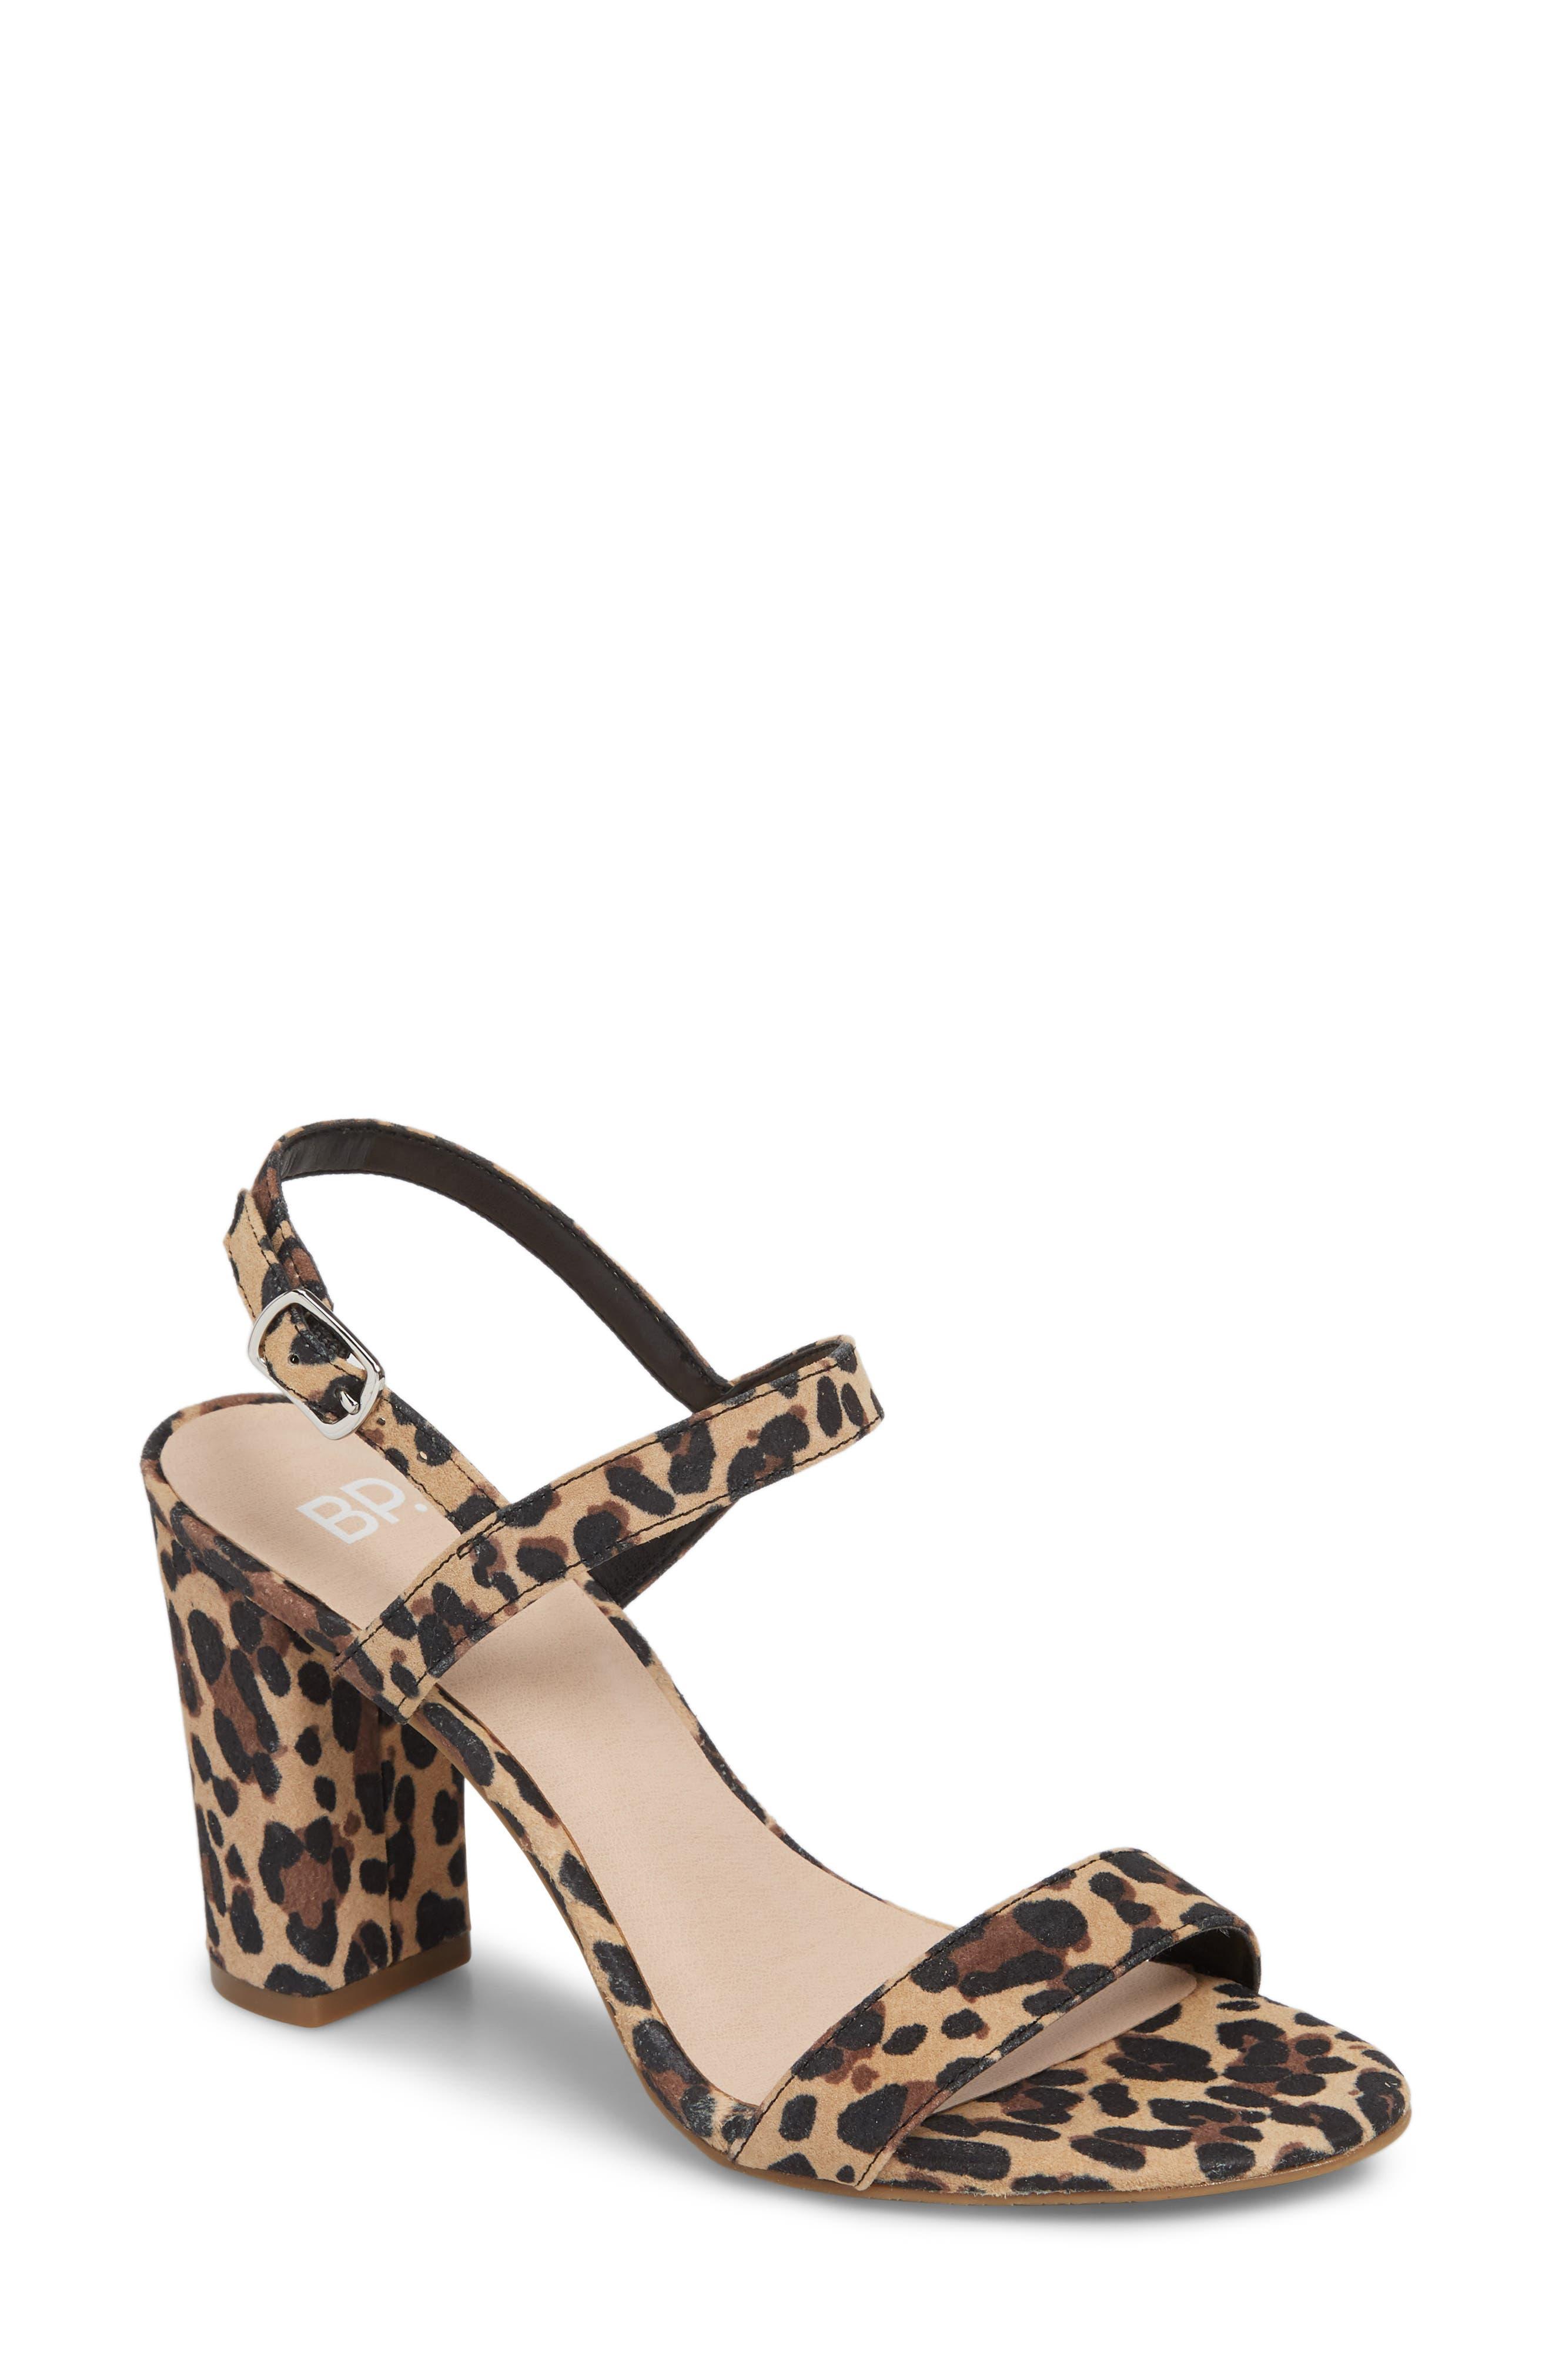 Lula Block Heel Slingback Sandal, Main, color, LEOPARD PRINT LEATHER